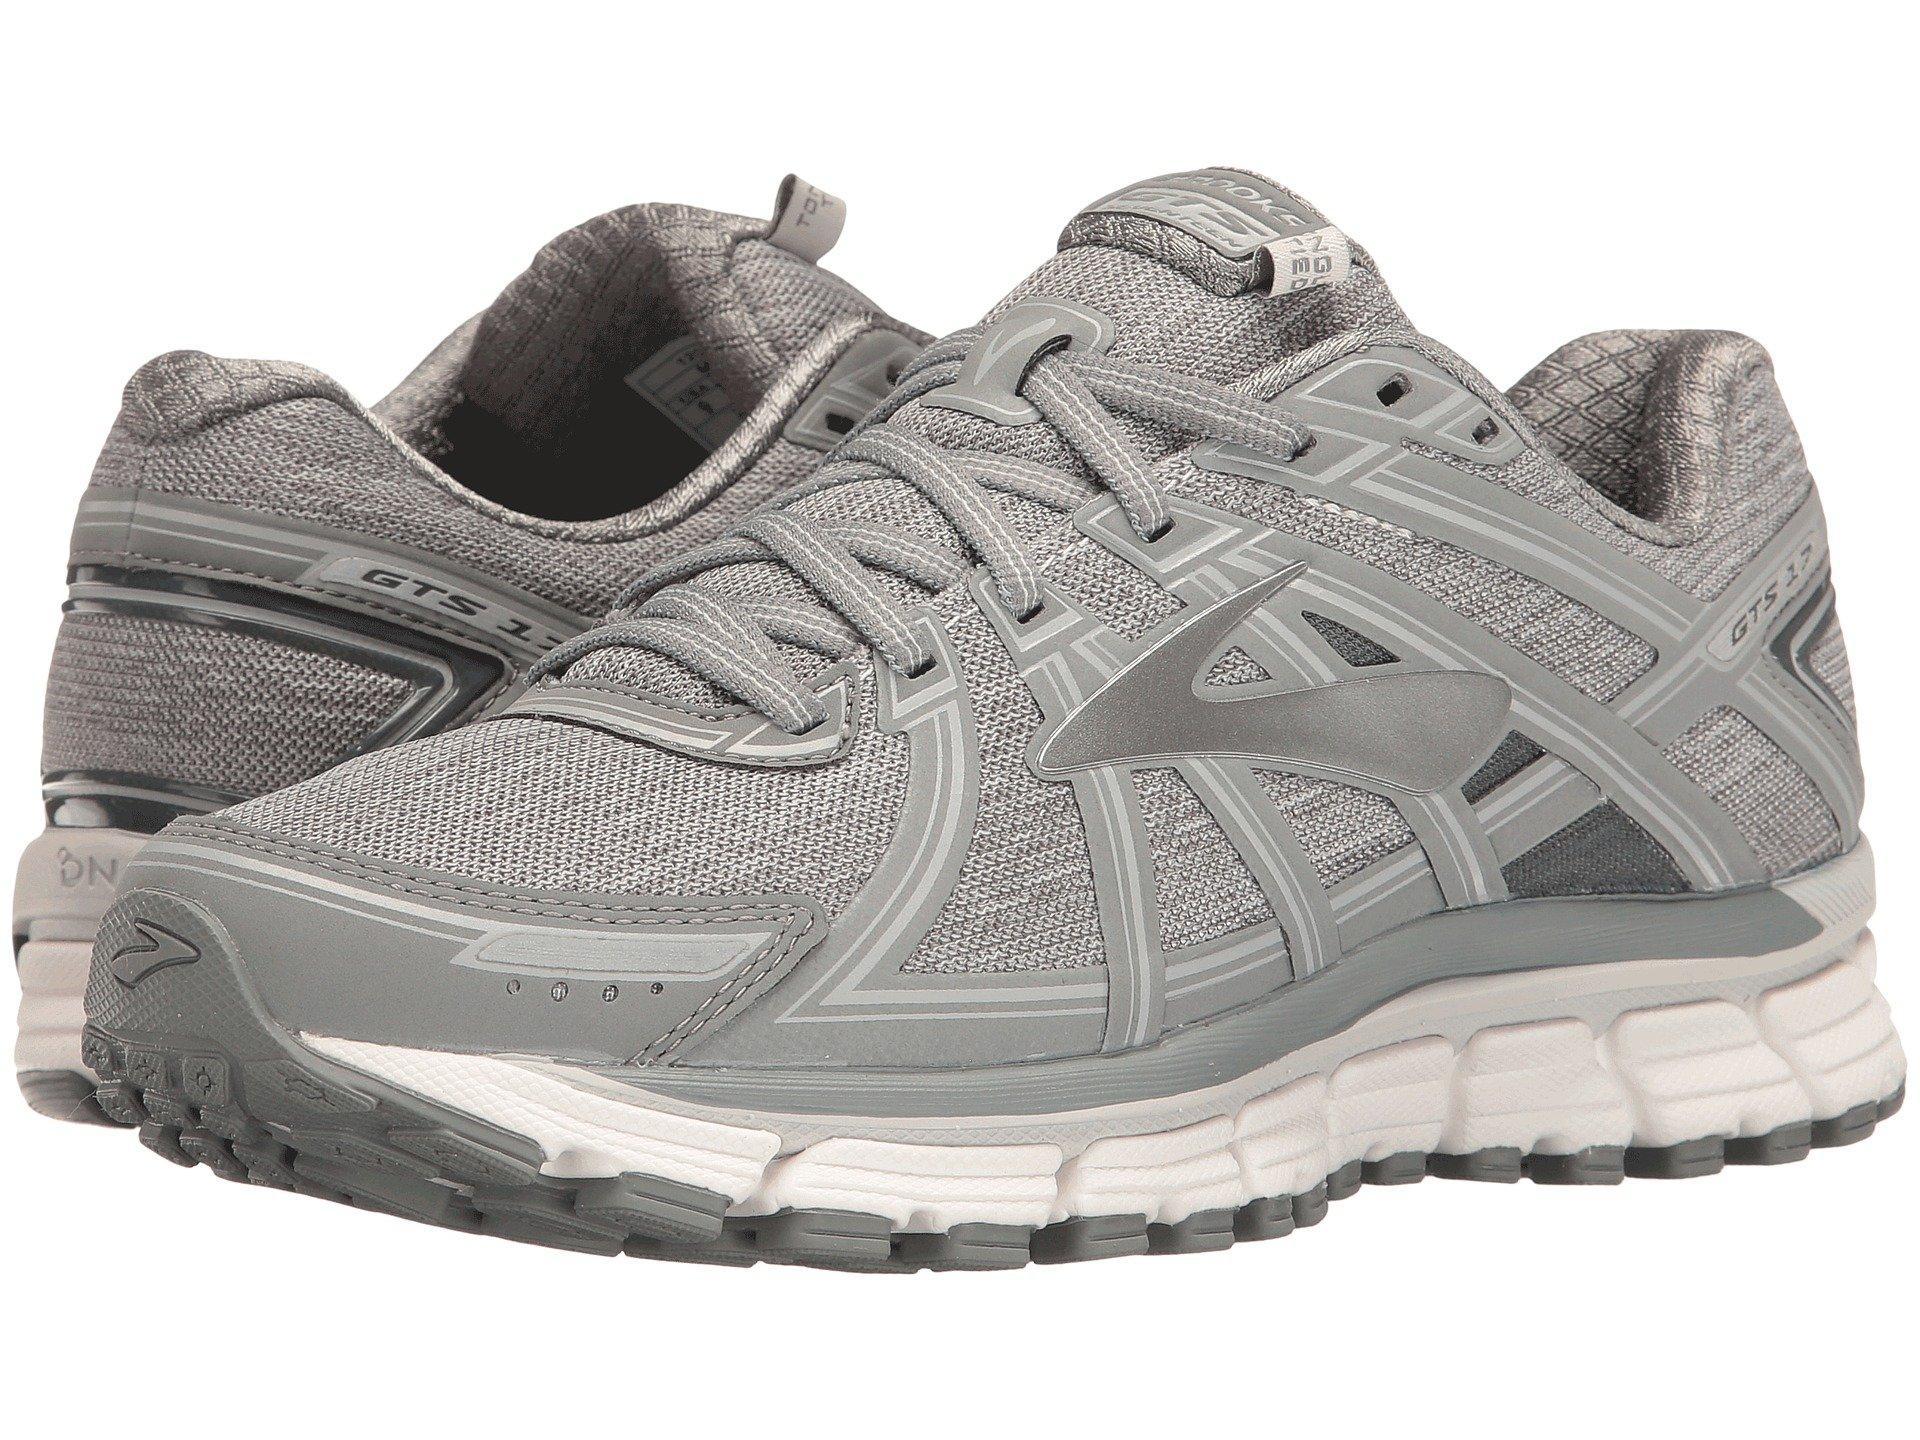 c87e69e4adb Brooks Adrenaline Gts 17 Running Shoe In Heather  Primer Grey  Grey ...